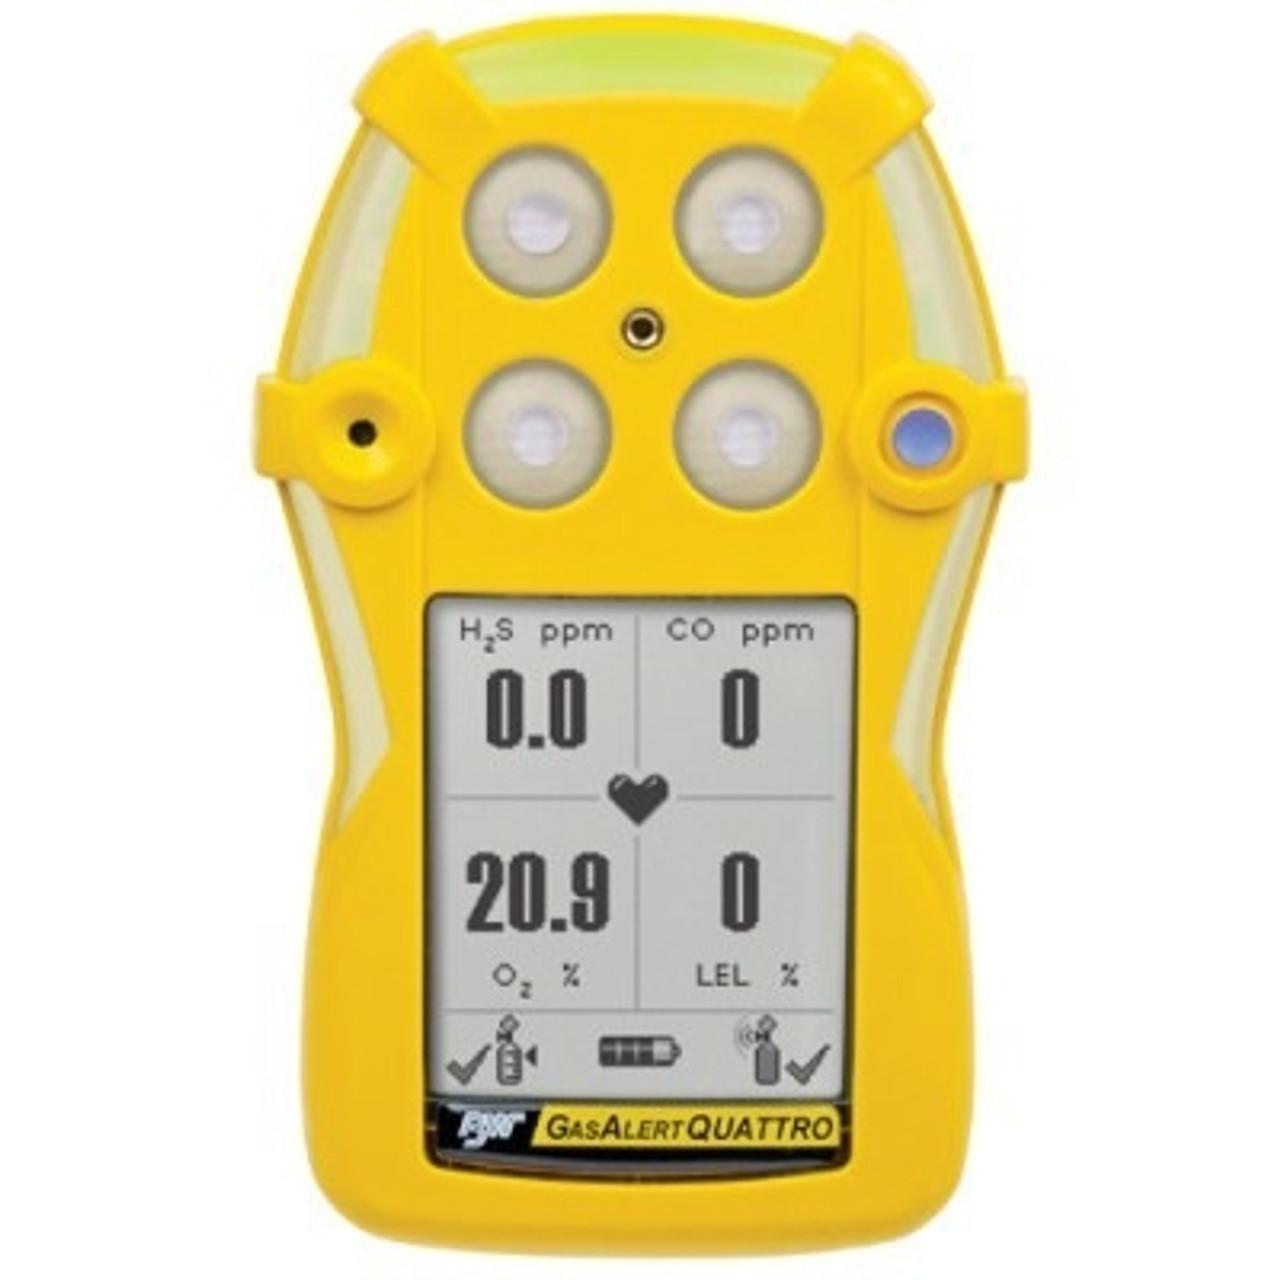 BW Gas Alert Quattro  - Accessories & Spares